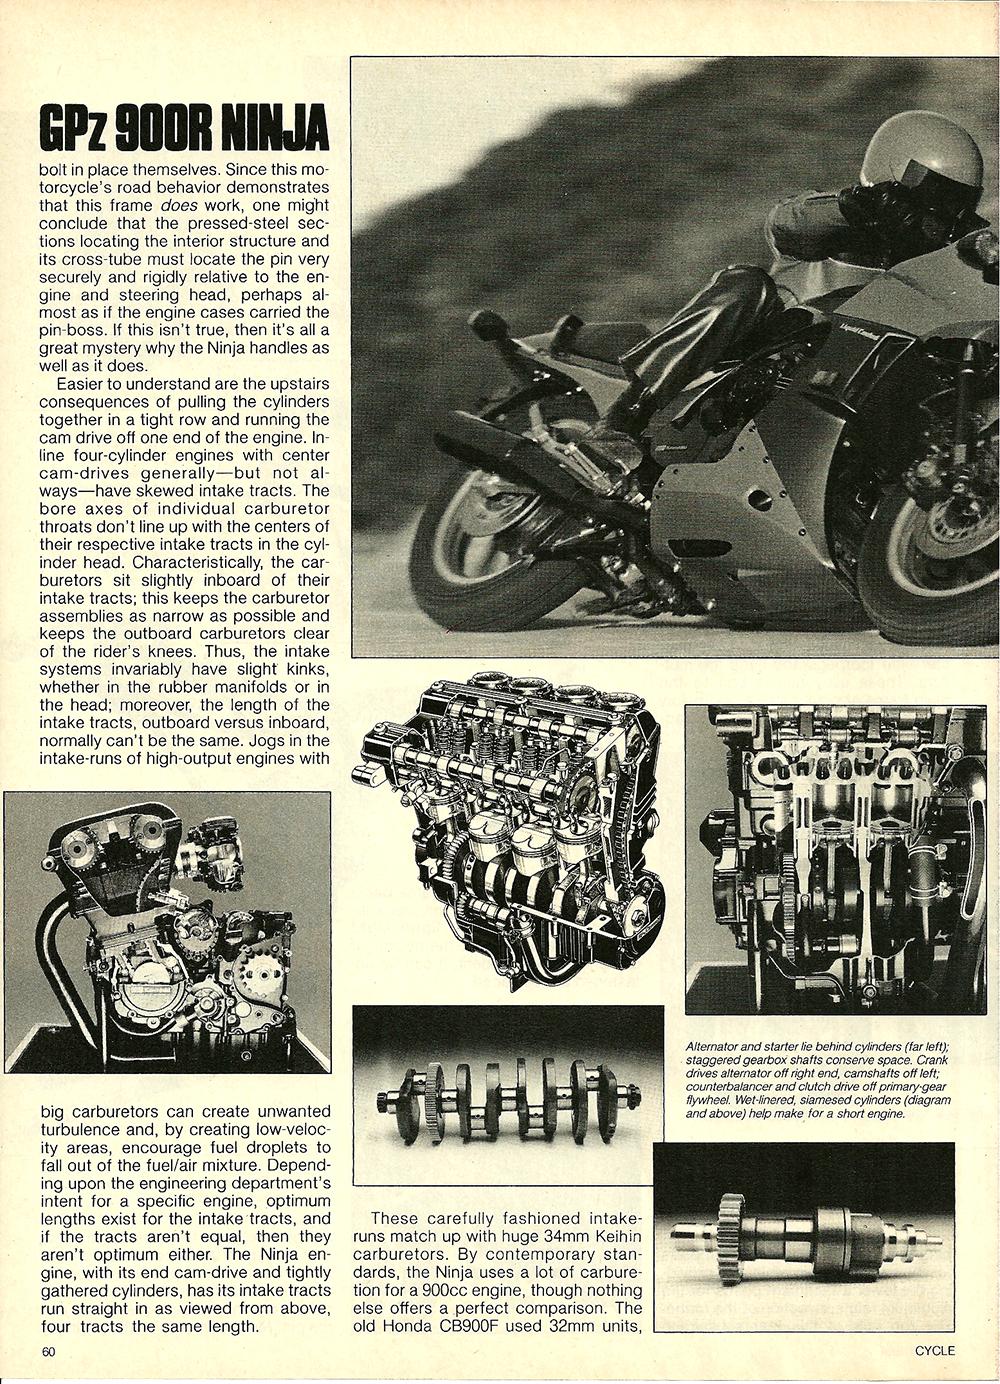 1984 Kawasaki GPz 900R Ninja road test 06.jpg